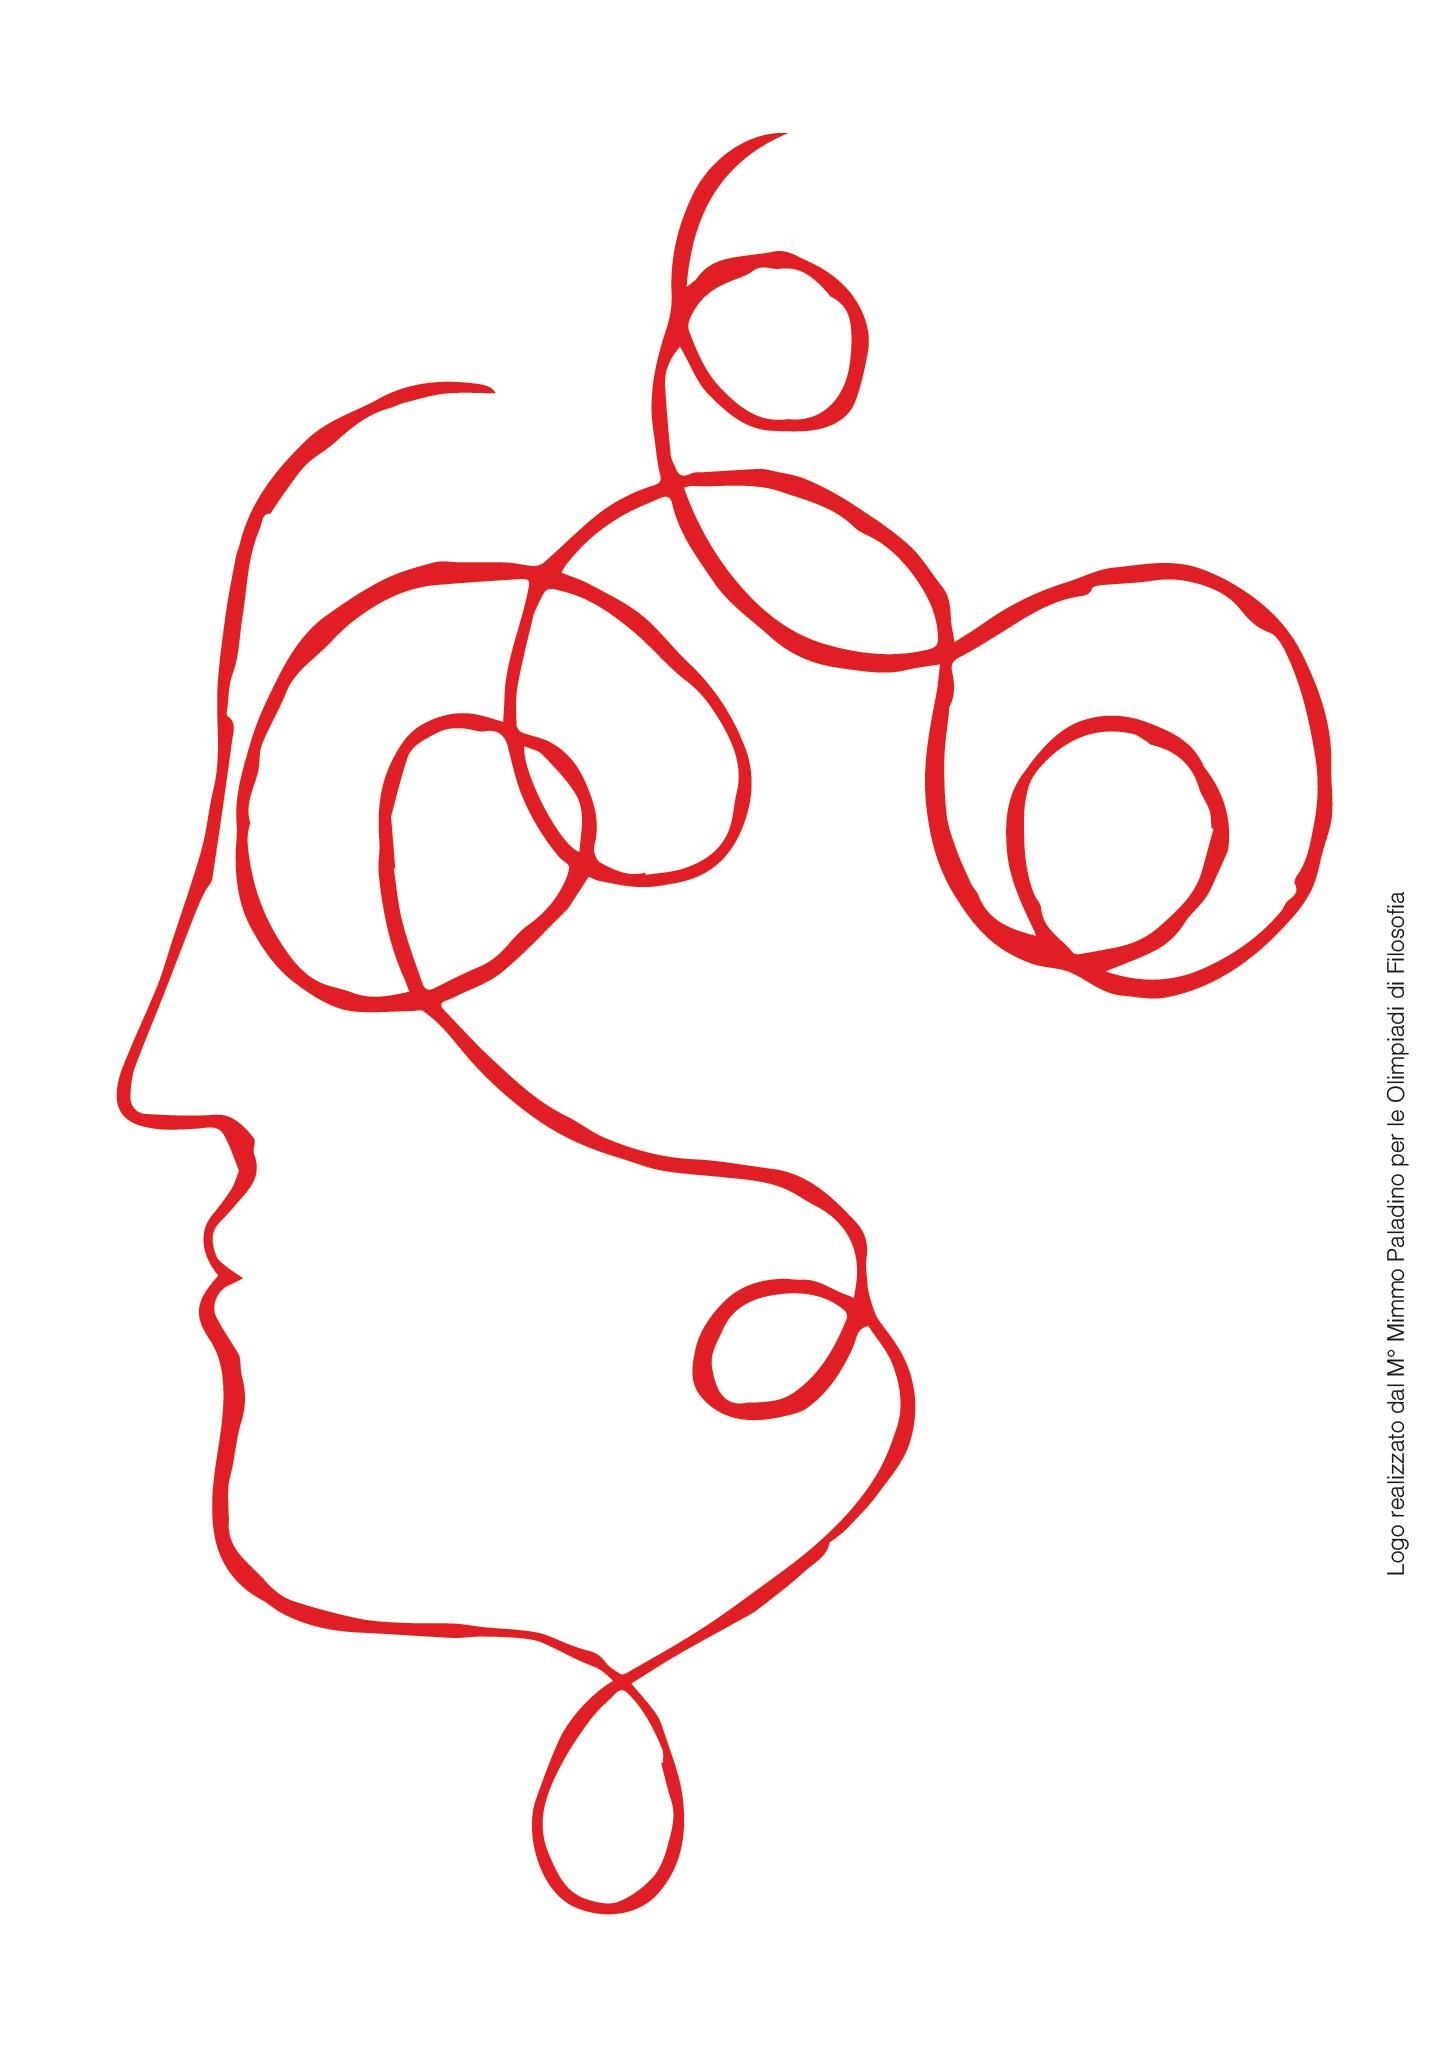 logo-olimpiadi-filosofia